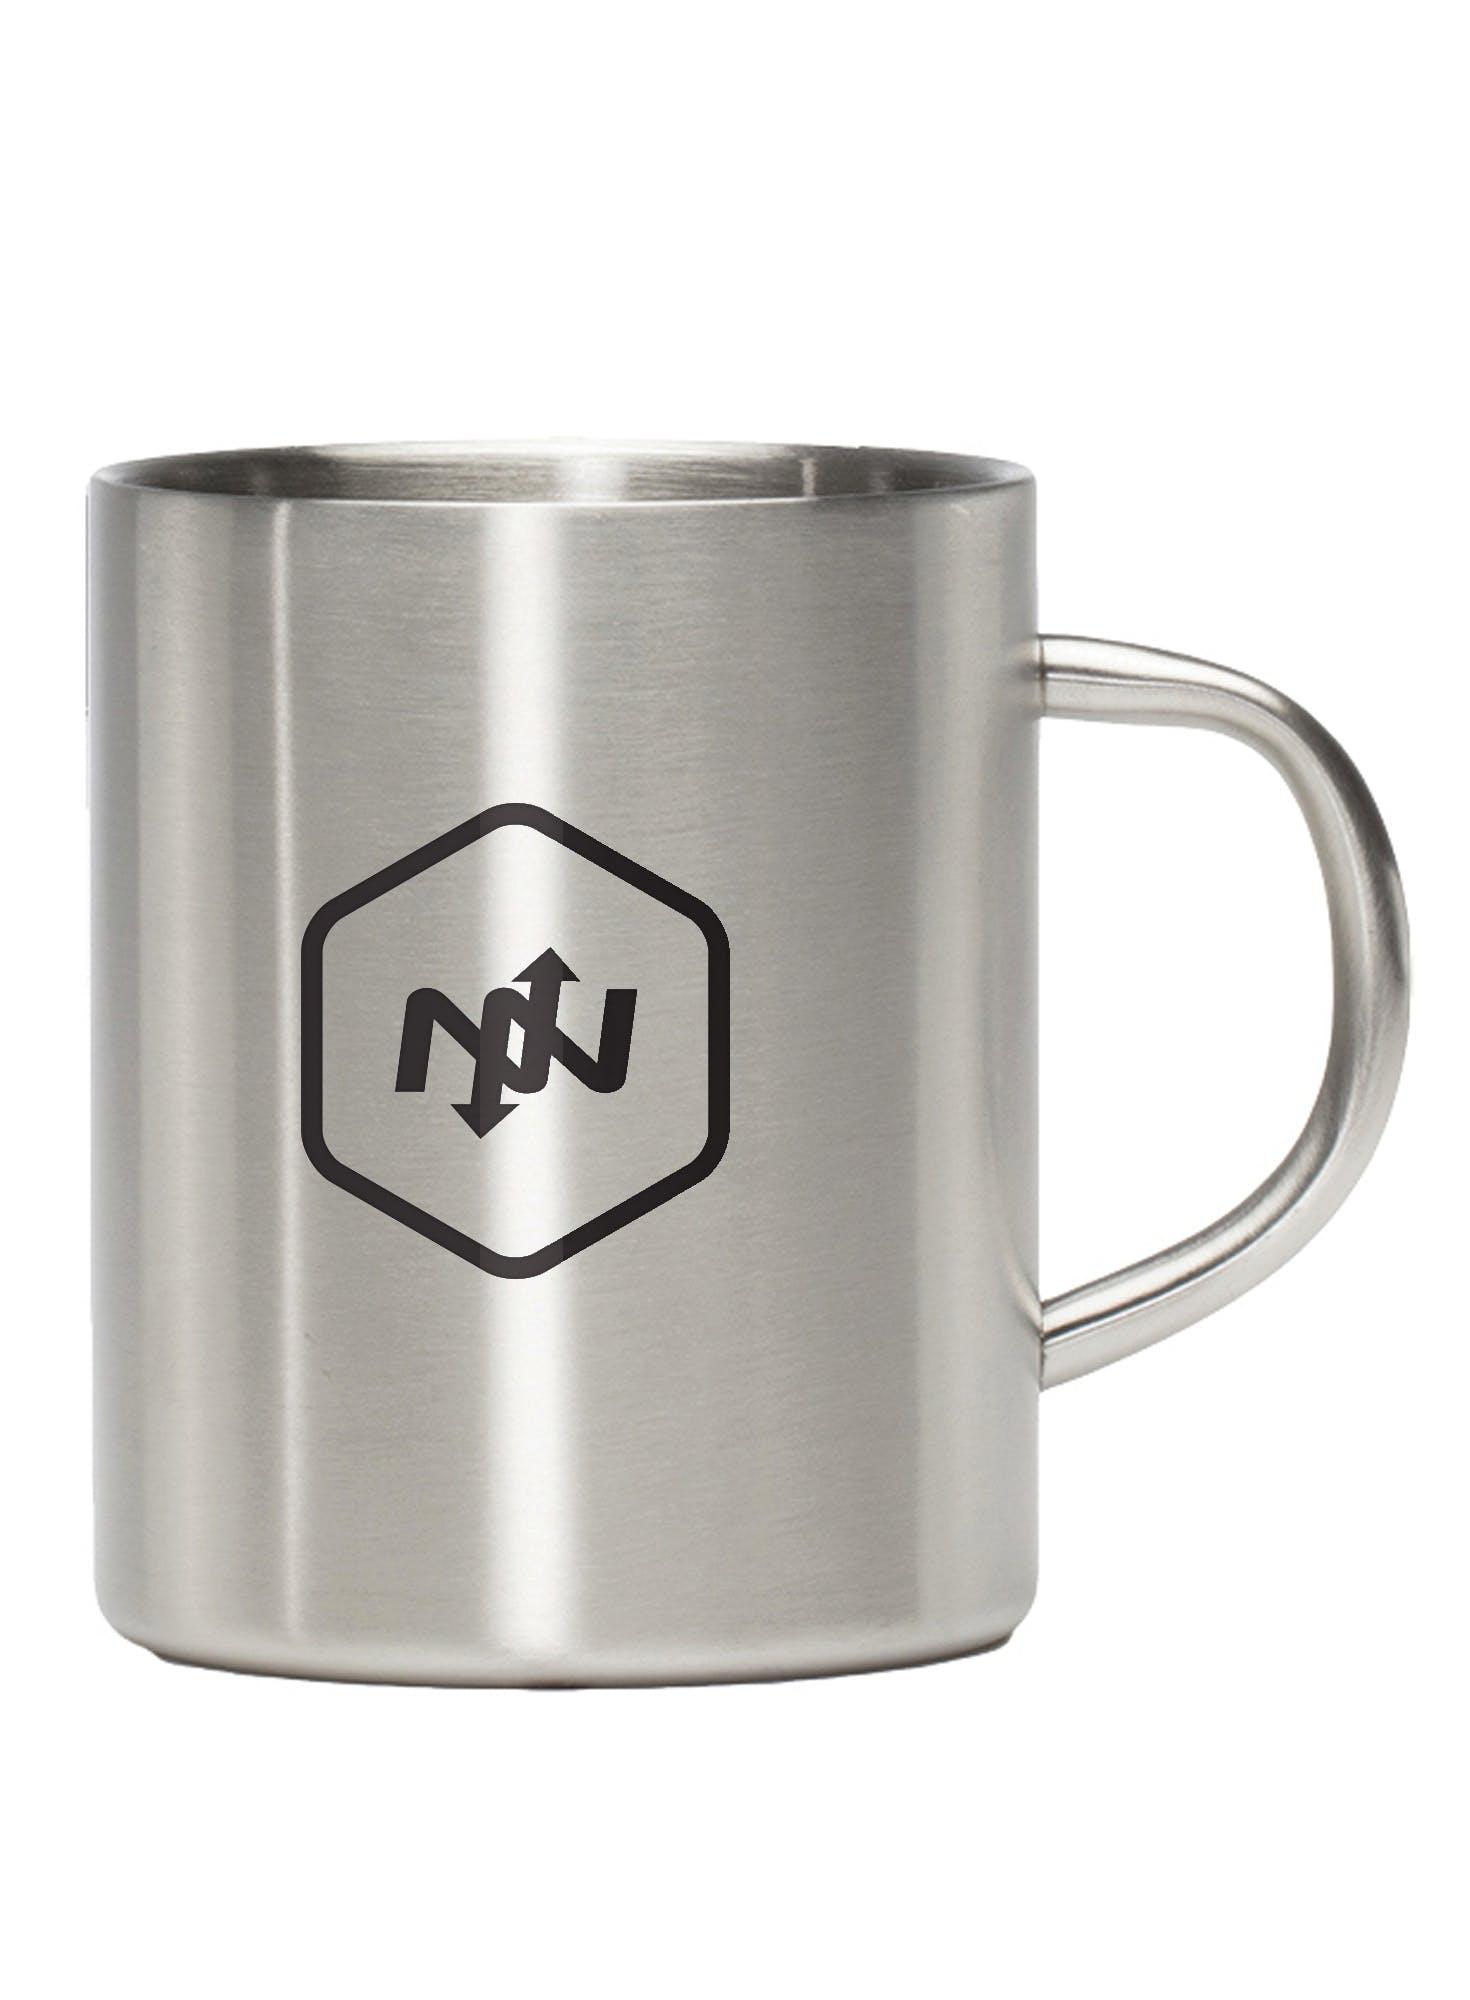 Onnit x Mizu Camp Cup Bonus Image